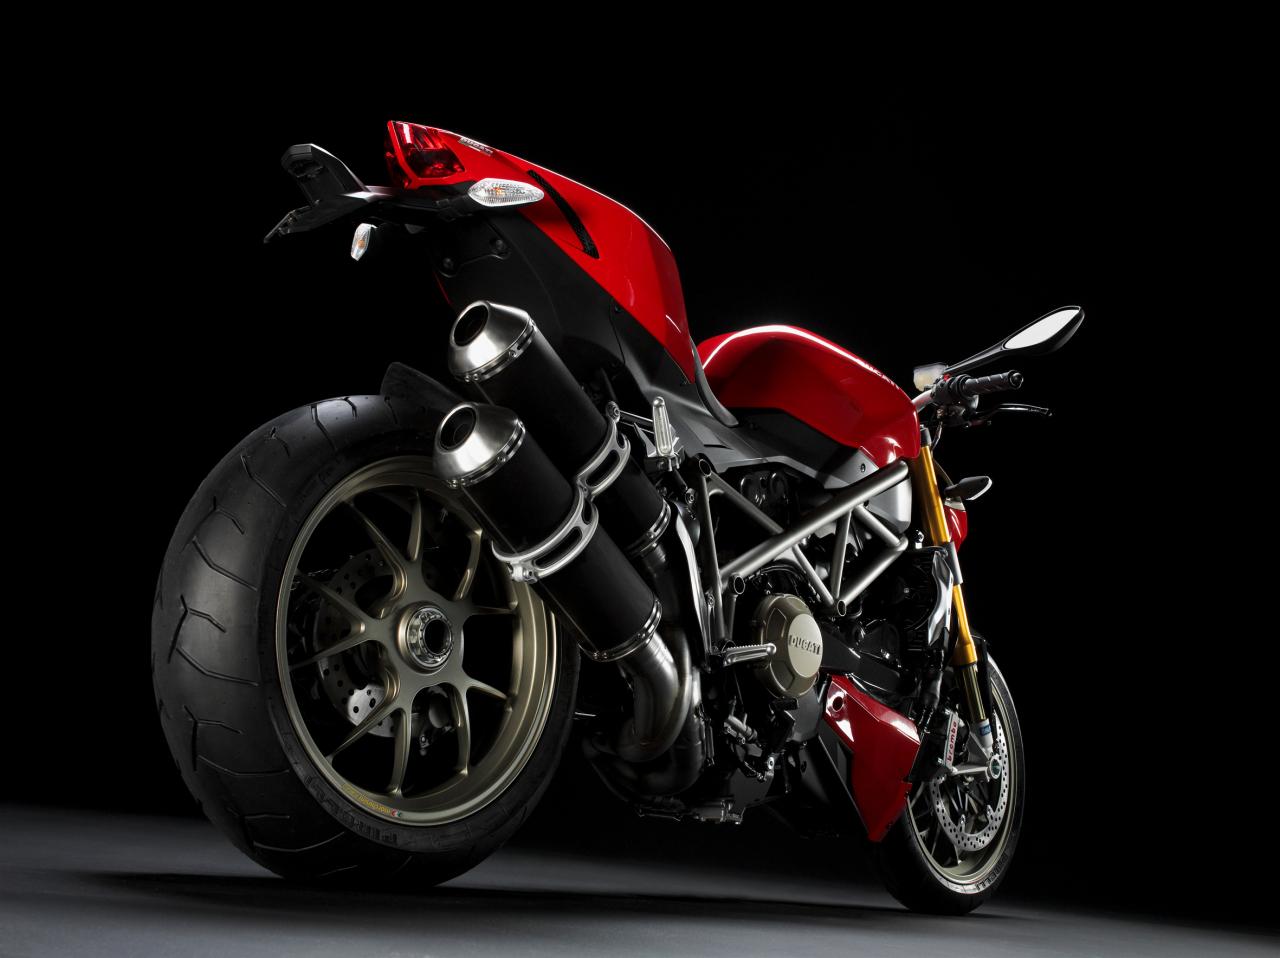 http://1.bp.blogspot.com/-7xxr-3_XuqE/TiJ7l81ZJyI/AAAAAAAAAzw/IzF37coEbDY/s1600/Motorcycle%20Vinyl%20Wall%20Art%20Wallpaper-Kawasaki.jpg